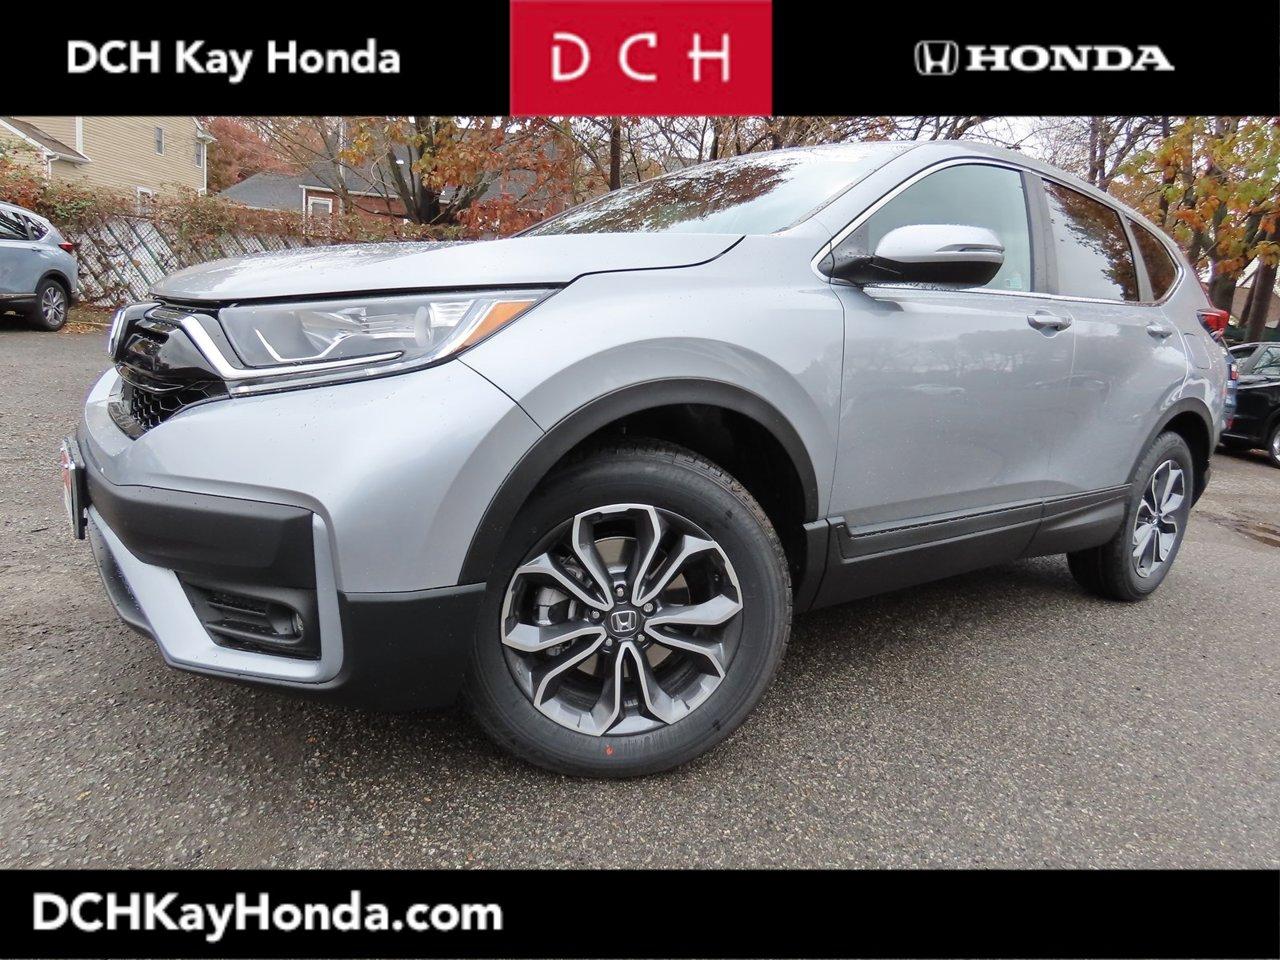 New 2020 Honda CR-V in Eatontown, NJ